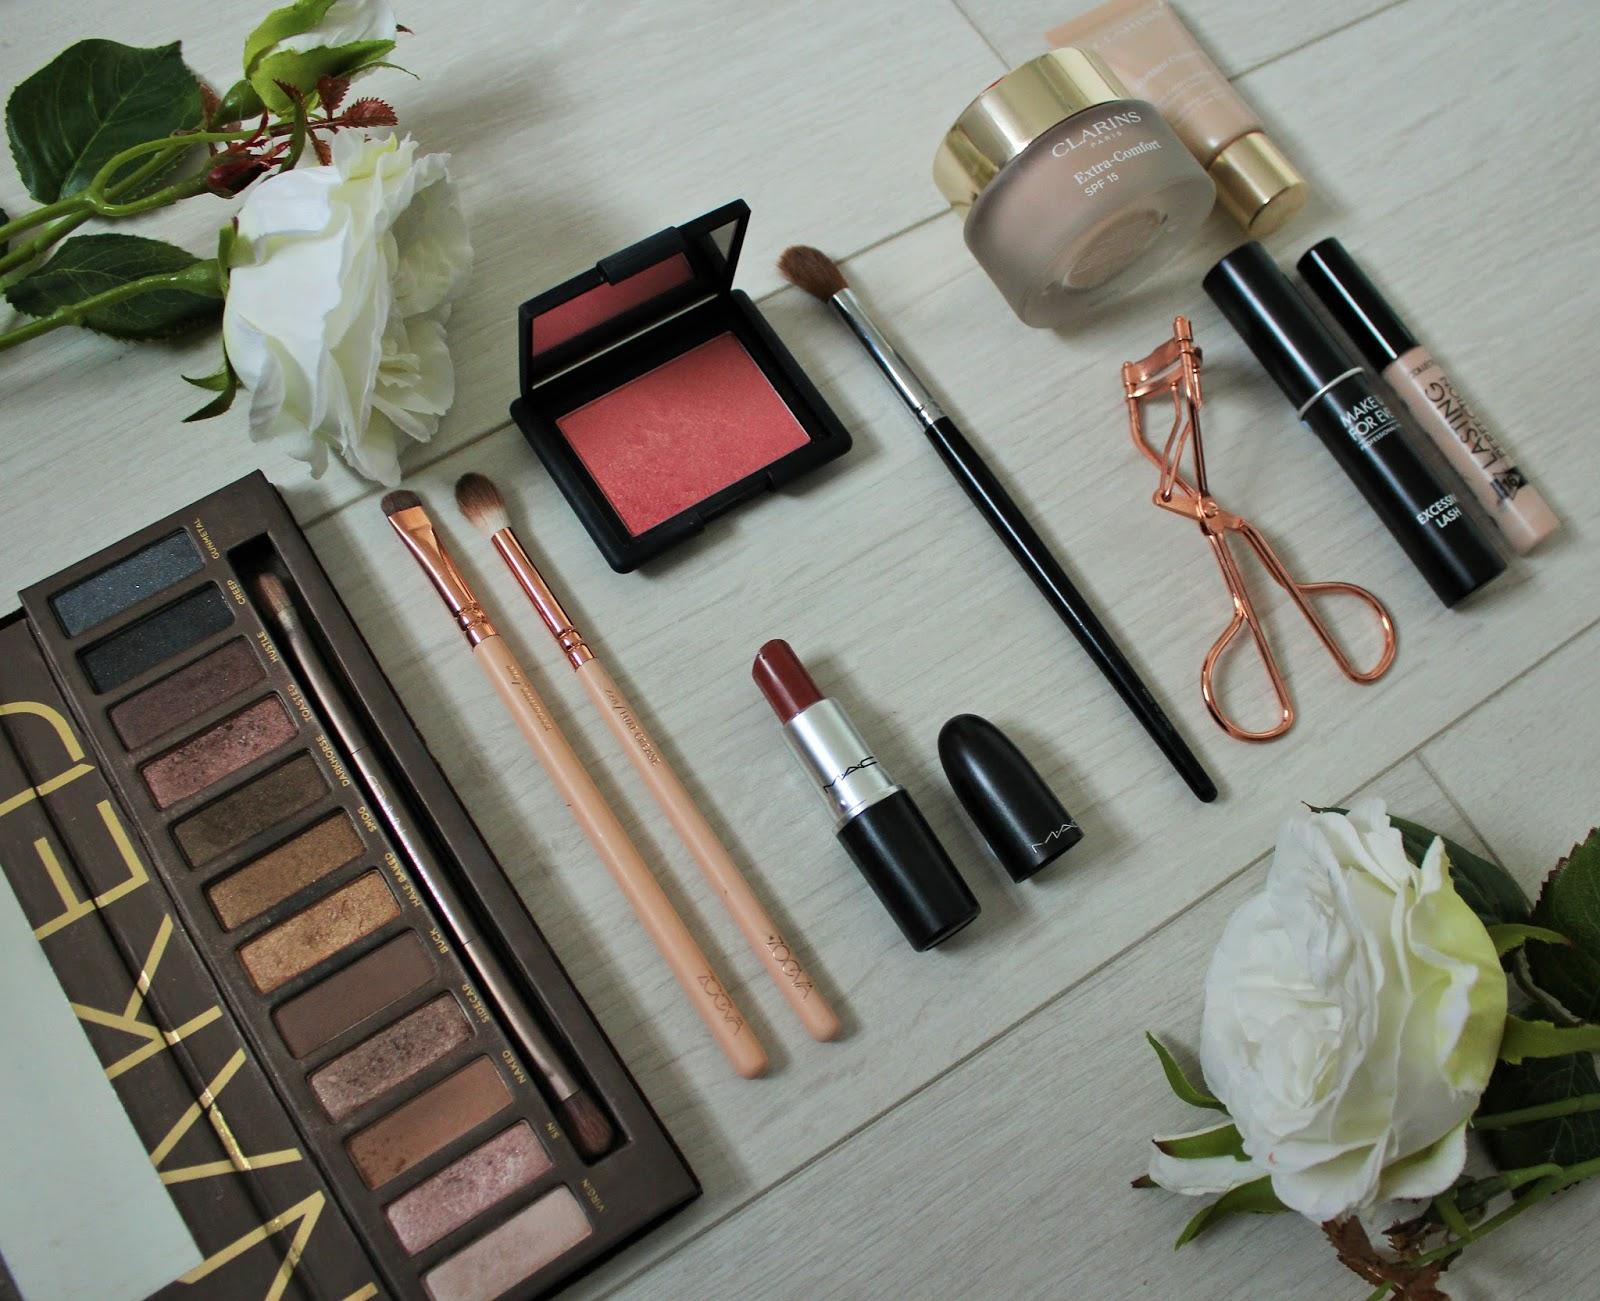 Emma Stone Oscars Inspired Makeup Look - 1